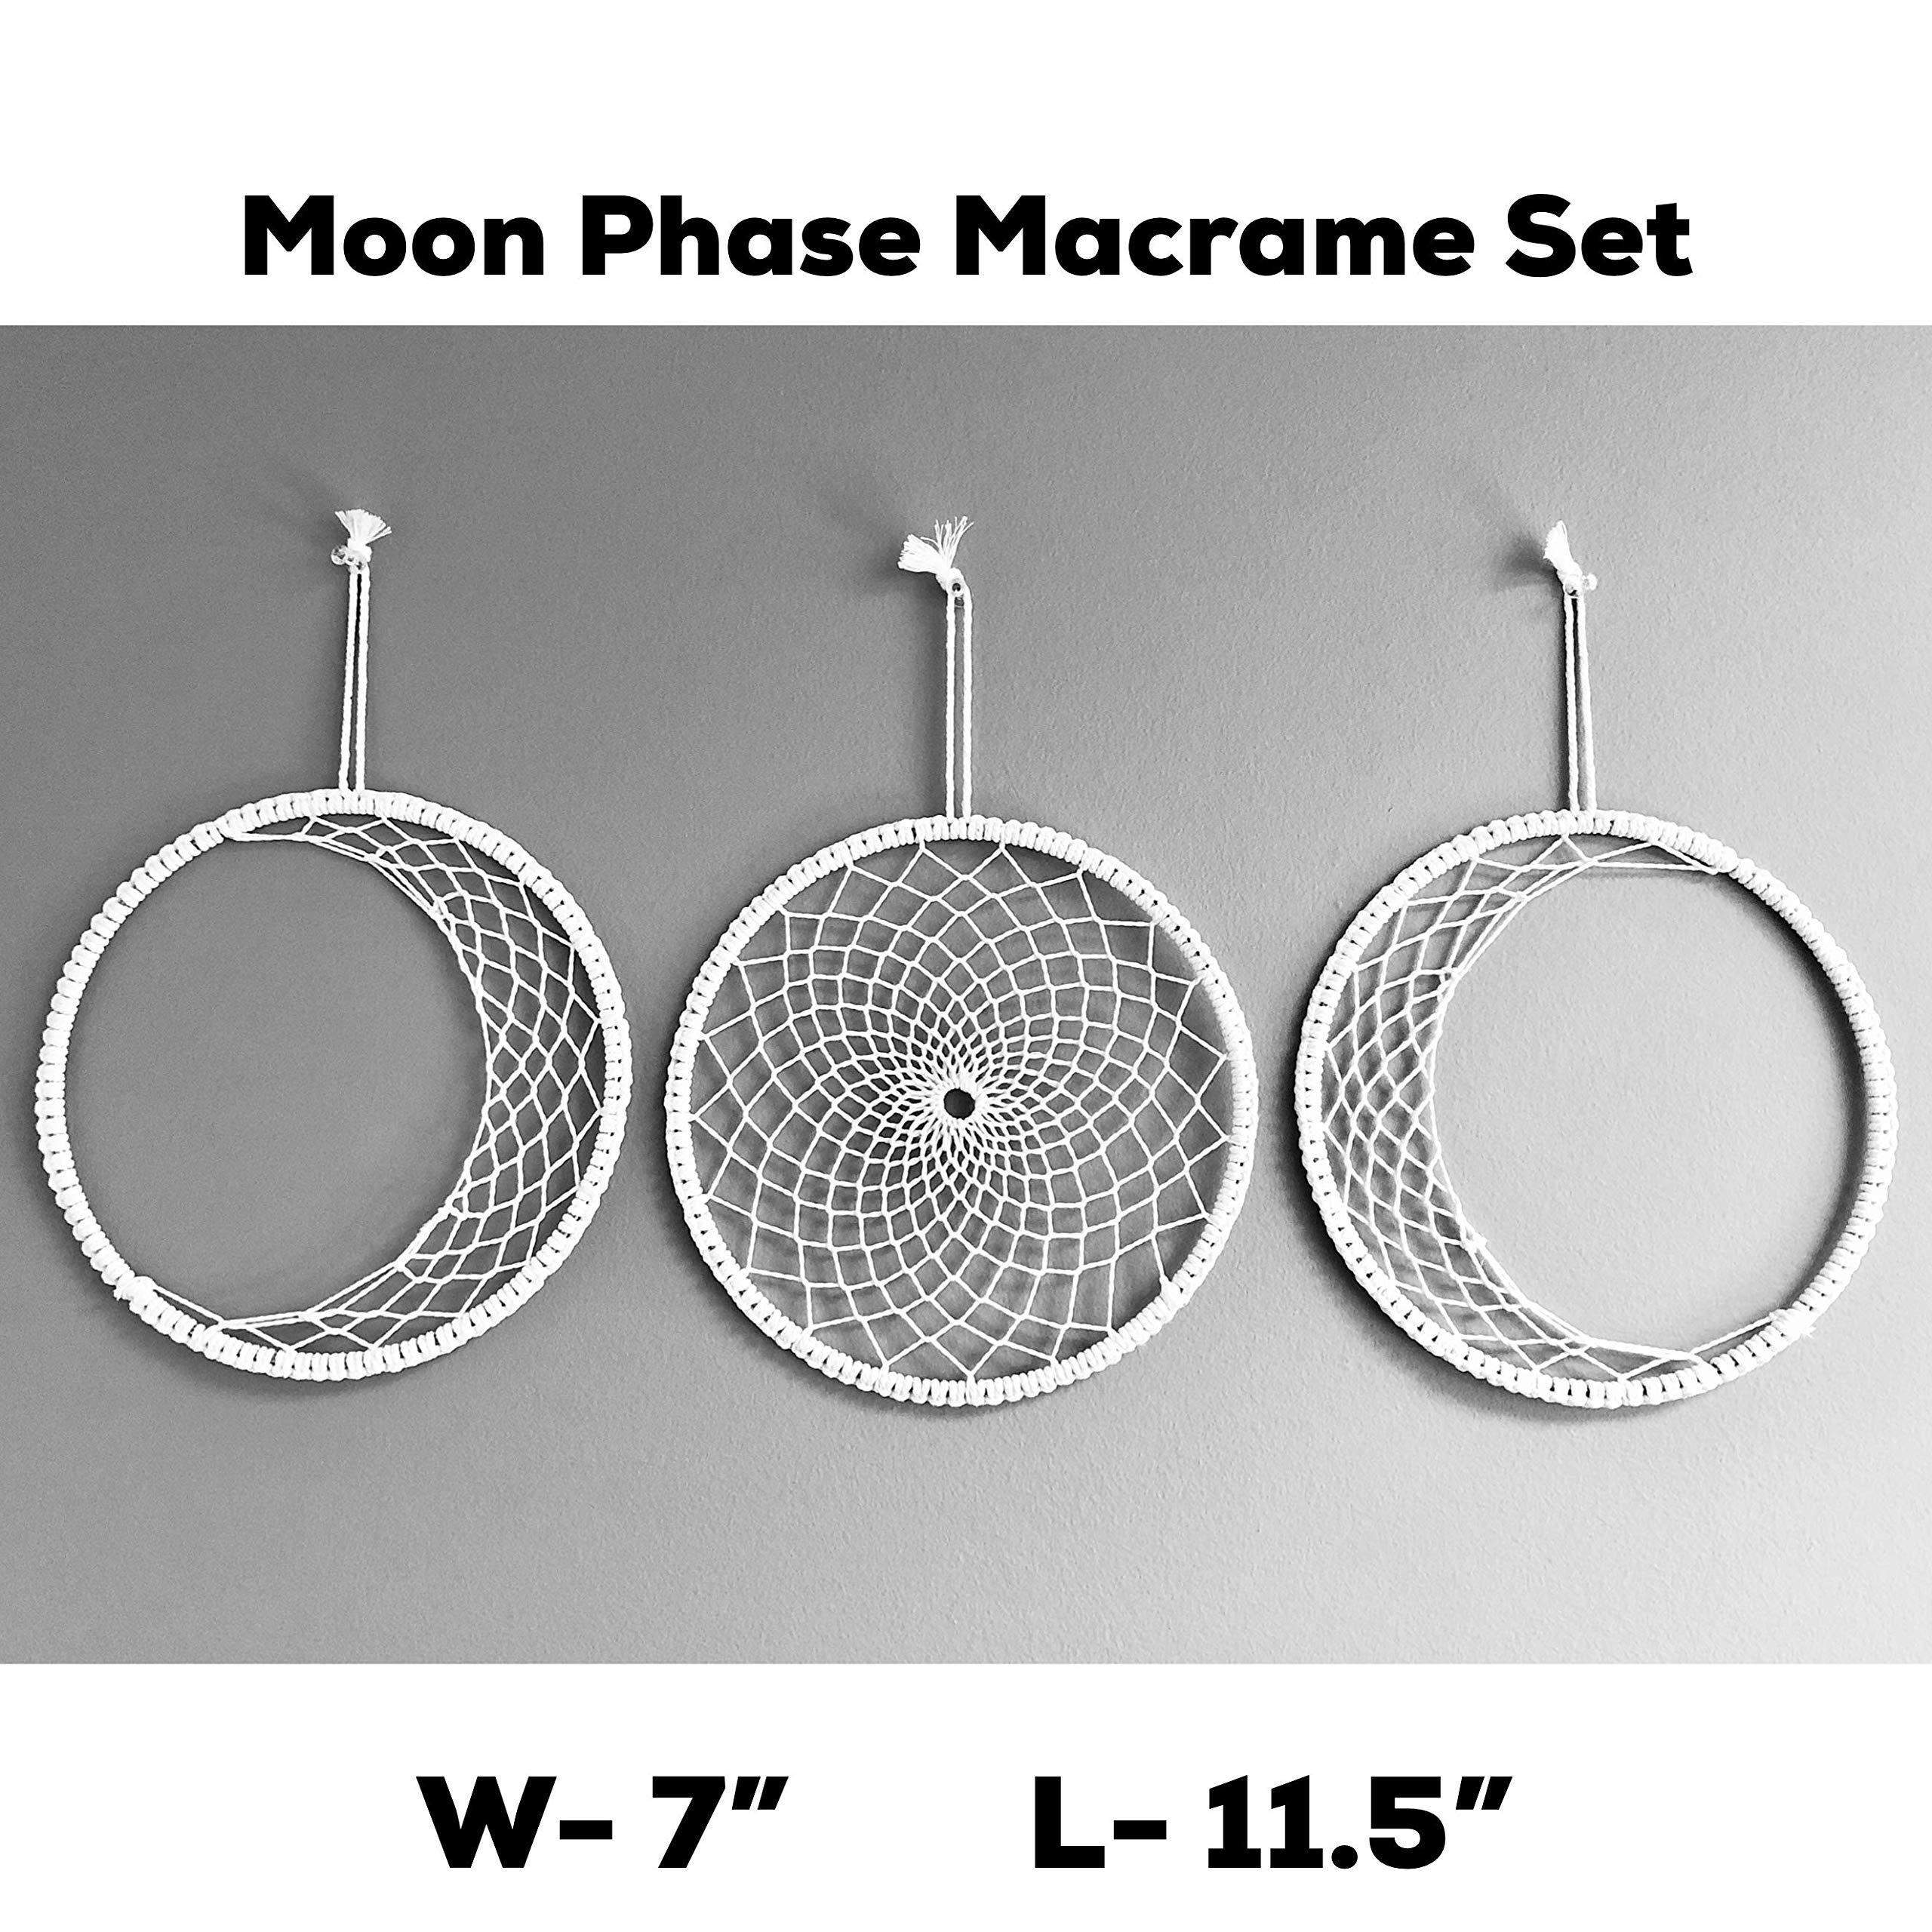 Moon Phase Macrame Wall Hanging- Boho Wall Decor - Bohemiam Hippie Chic Tapestry- Boho Wall Art for Bedroom, Home, Apartment- Geometric Woven Macrame Wall Decoration- L- 11.5'' W- 7.5''- 3 Pcs Set